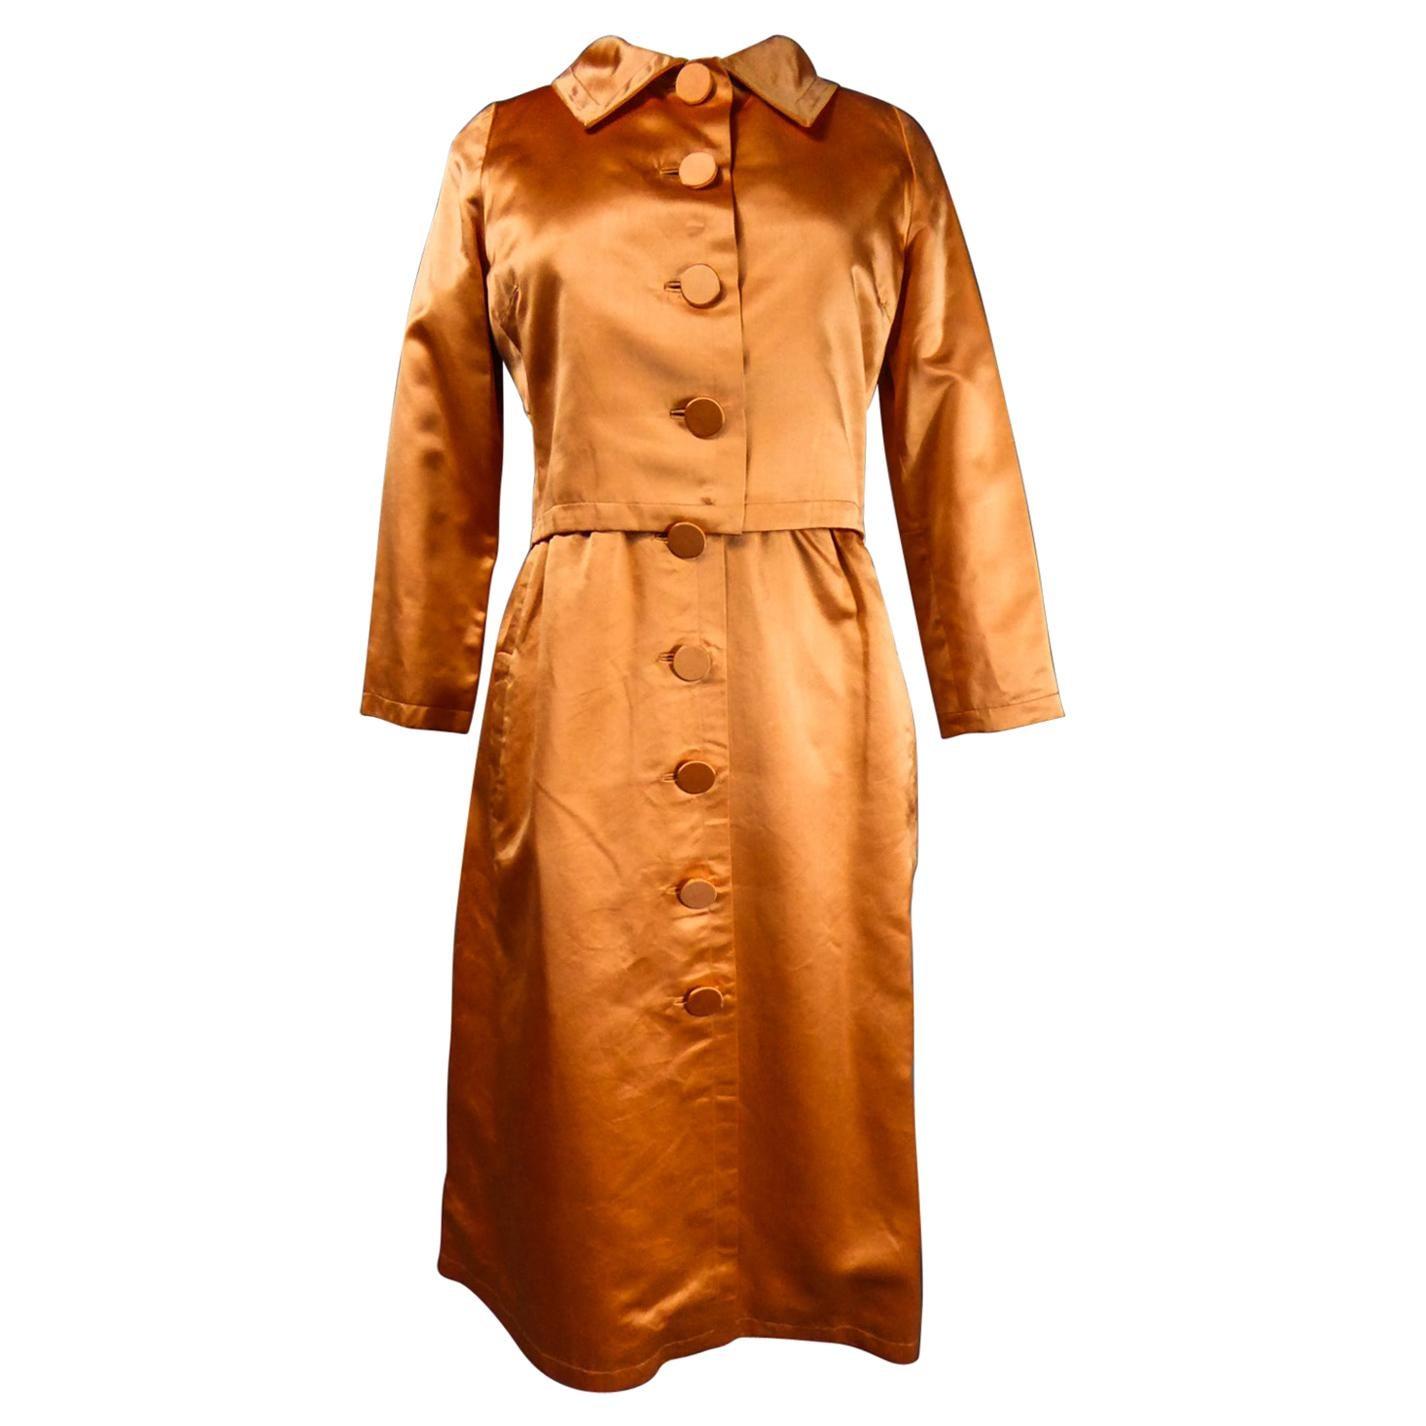 A Jacques Heim French Couture Mandarin Satin Silk Set Circa 1950/1960